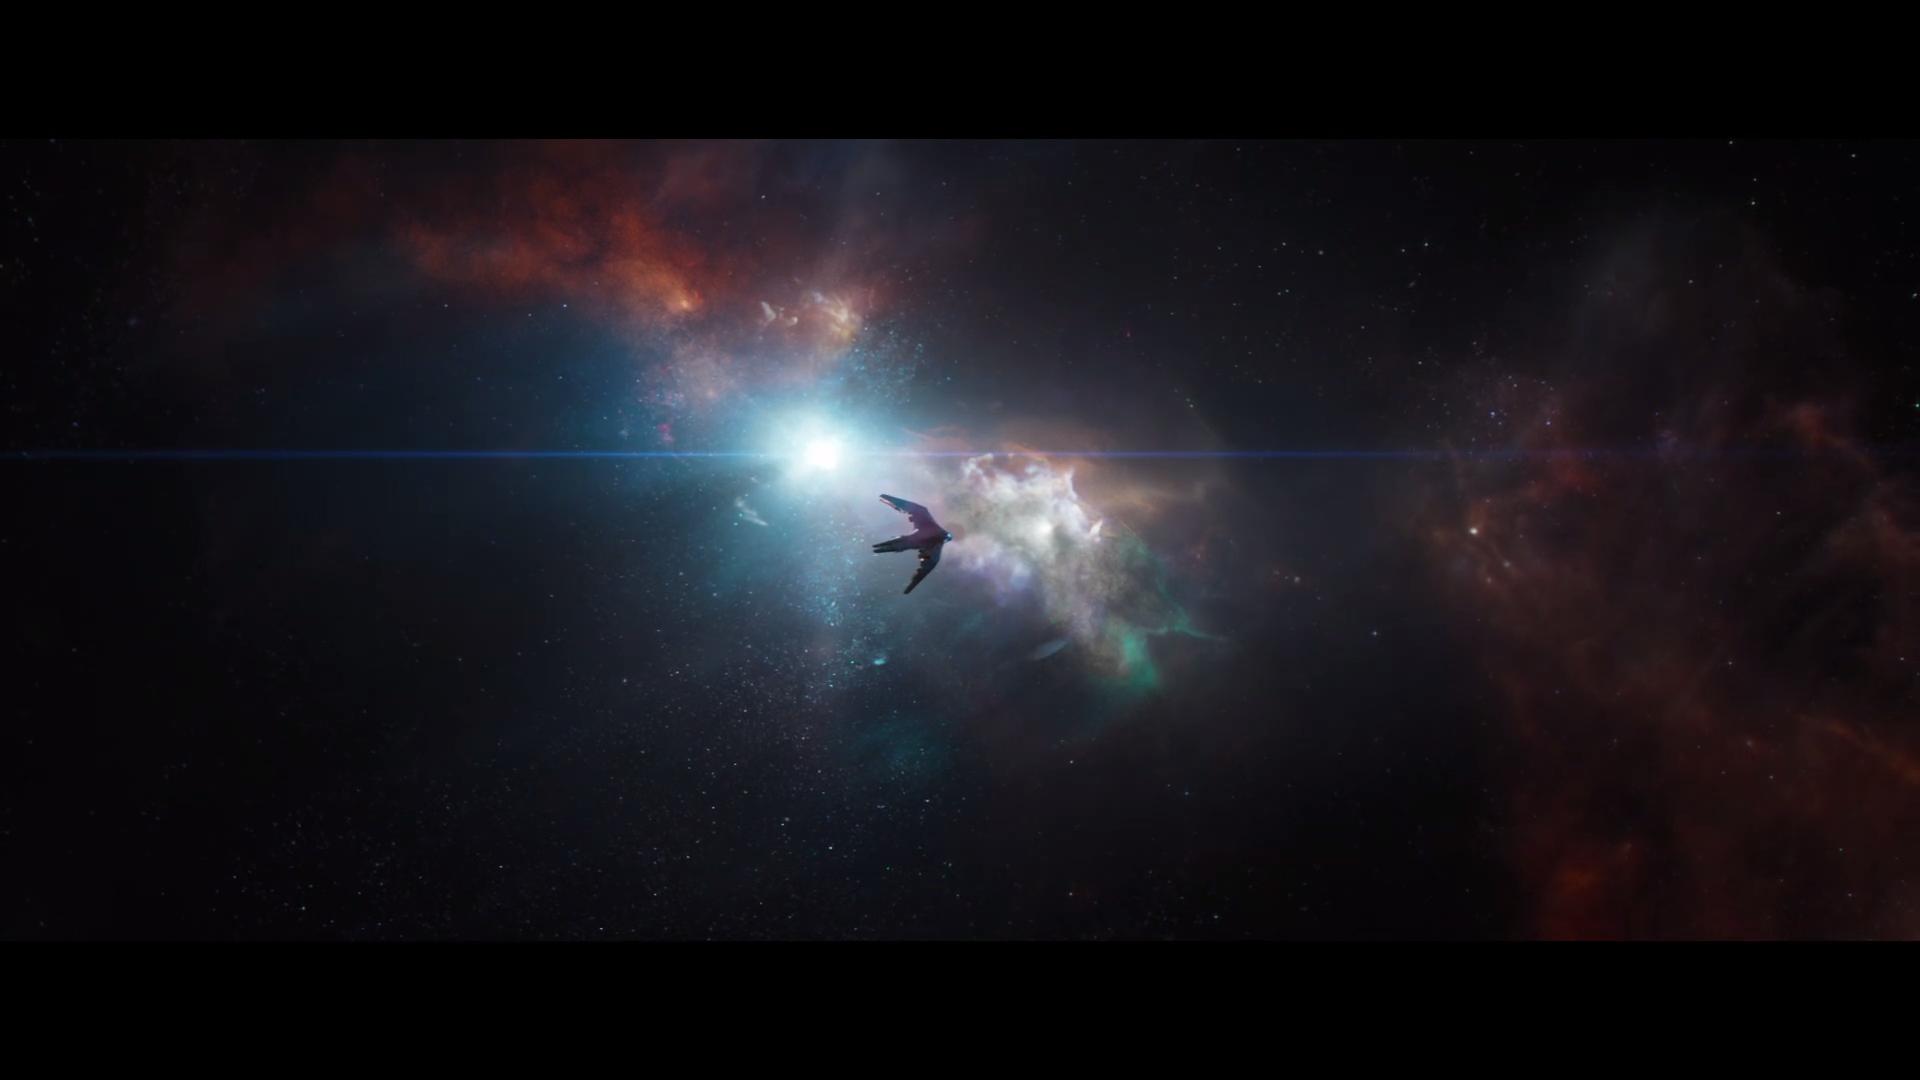 Avengers: Endgame: promotion campaign cost Marvel estimated